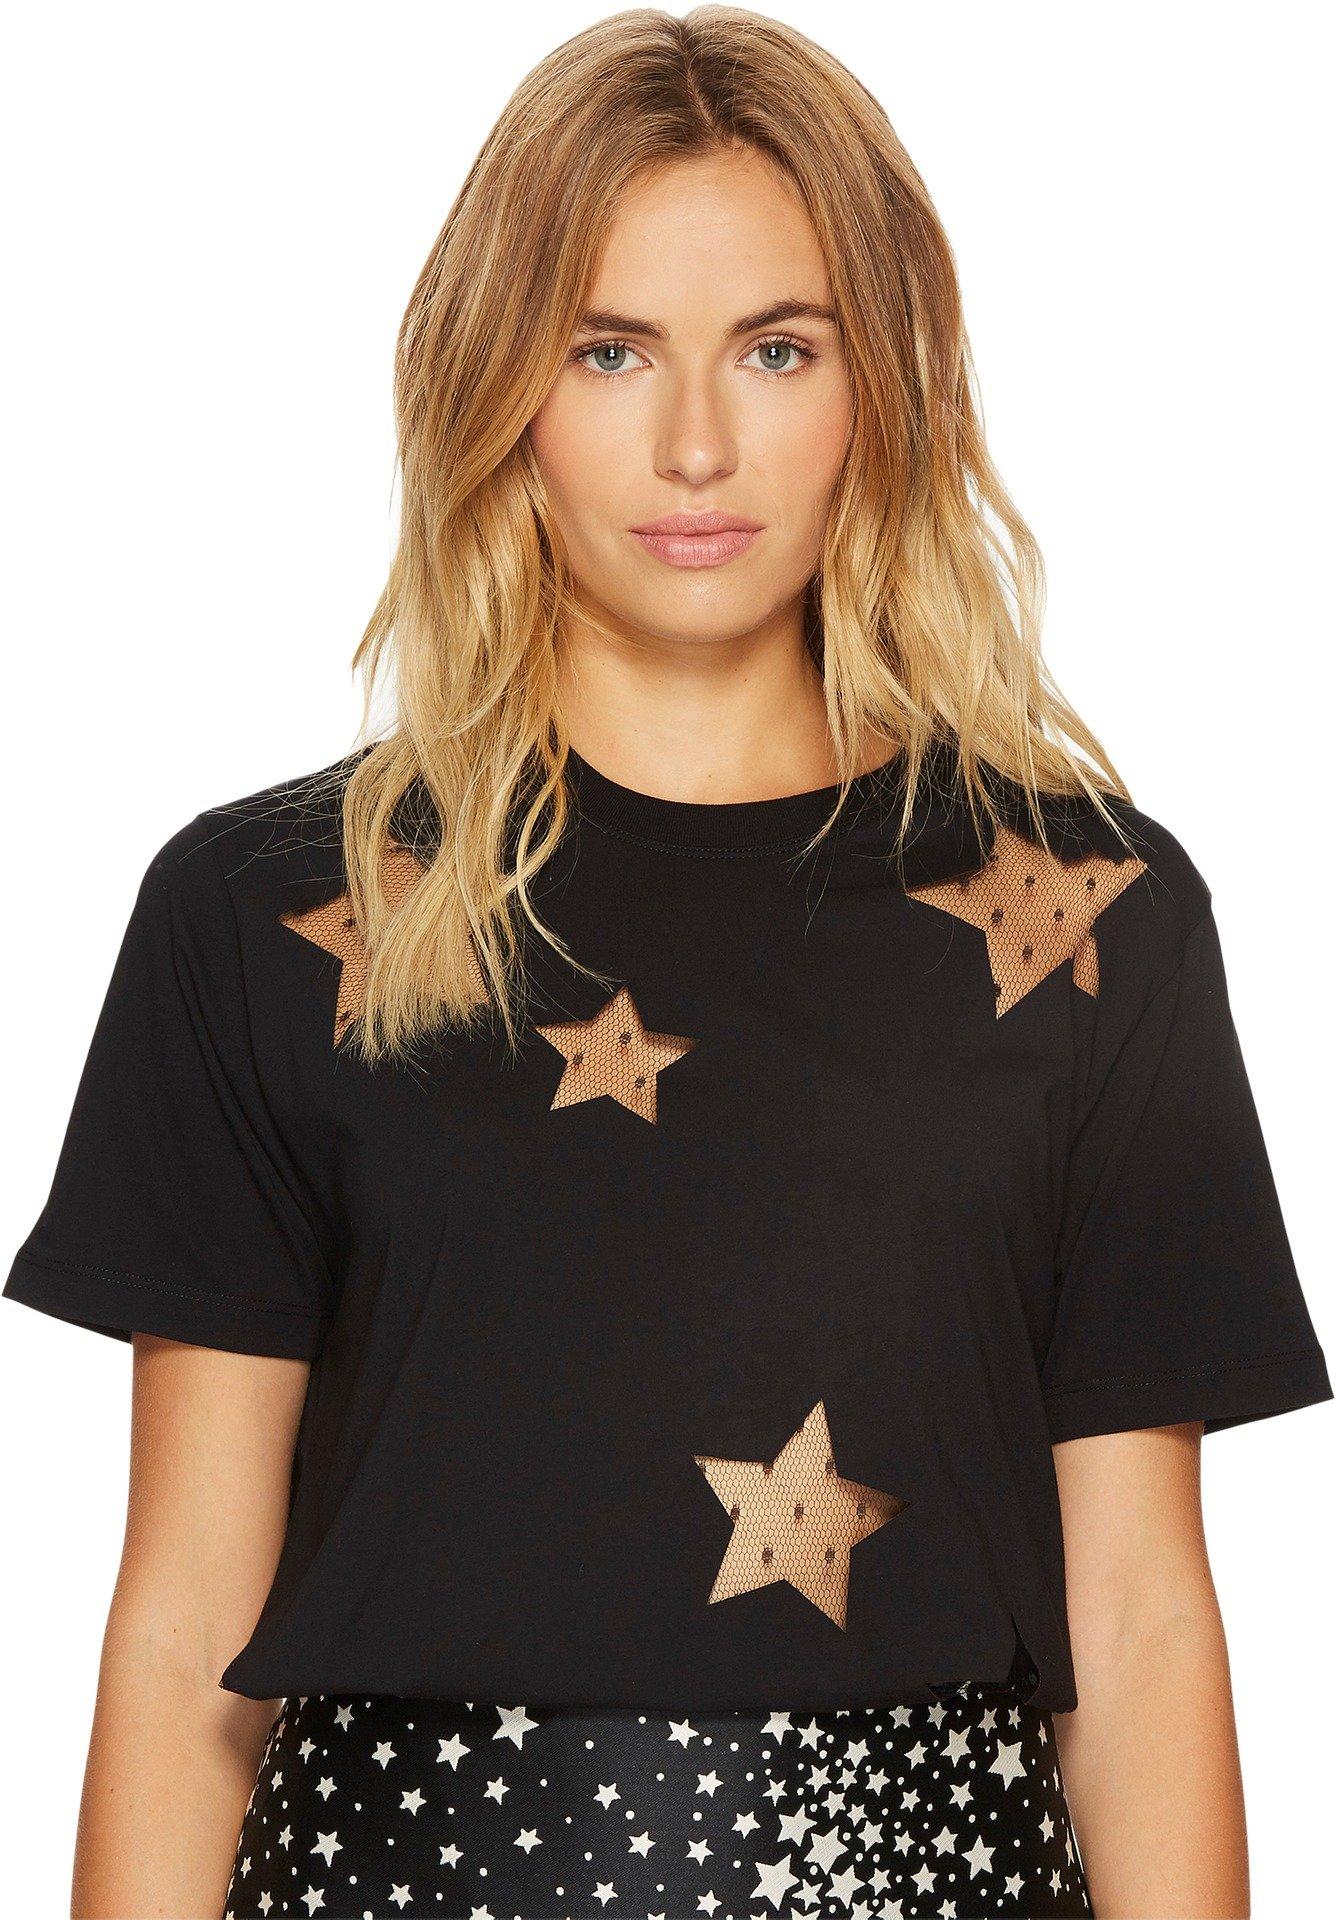 RED VALENTINO Women's Light Cotton Jersey & Heatsealed Point D'Esprit Stars Top Black Large